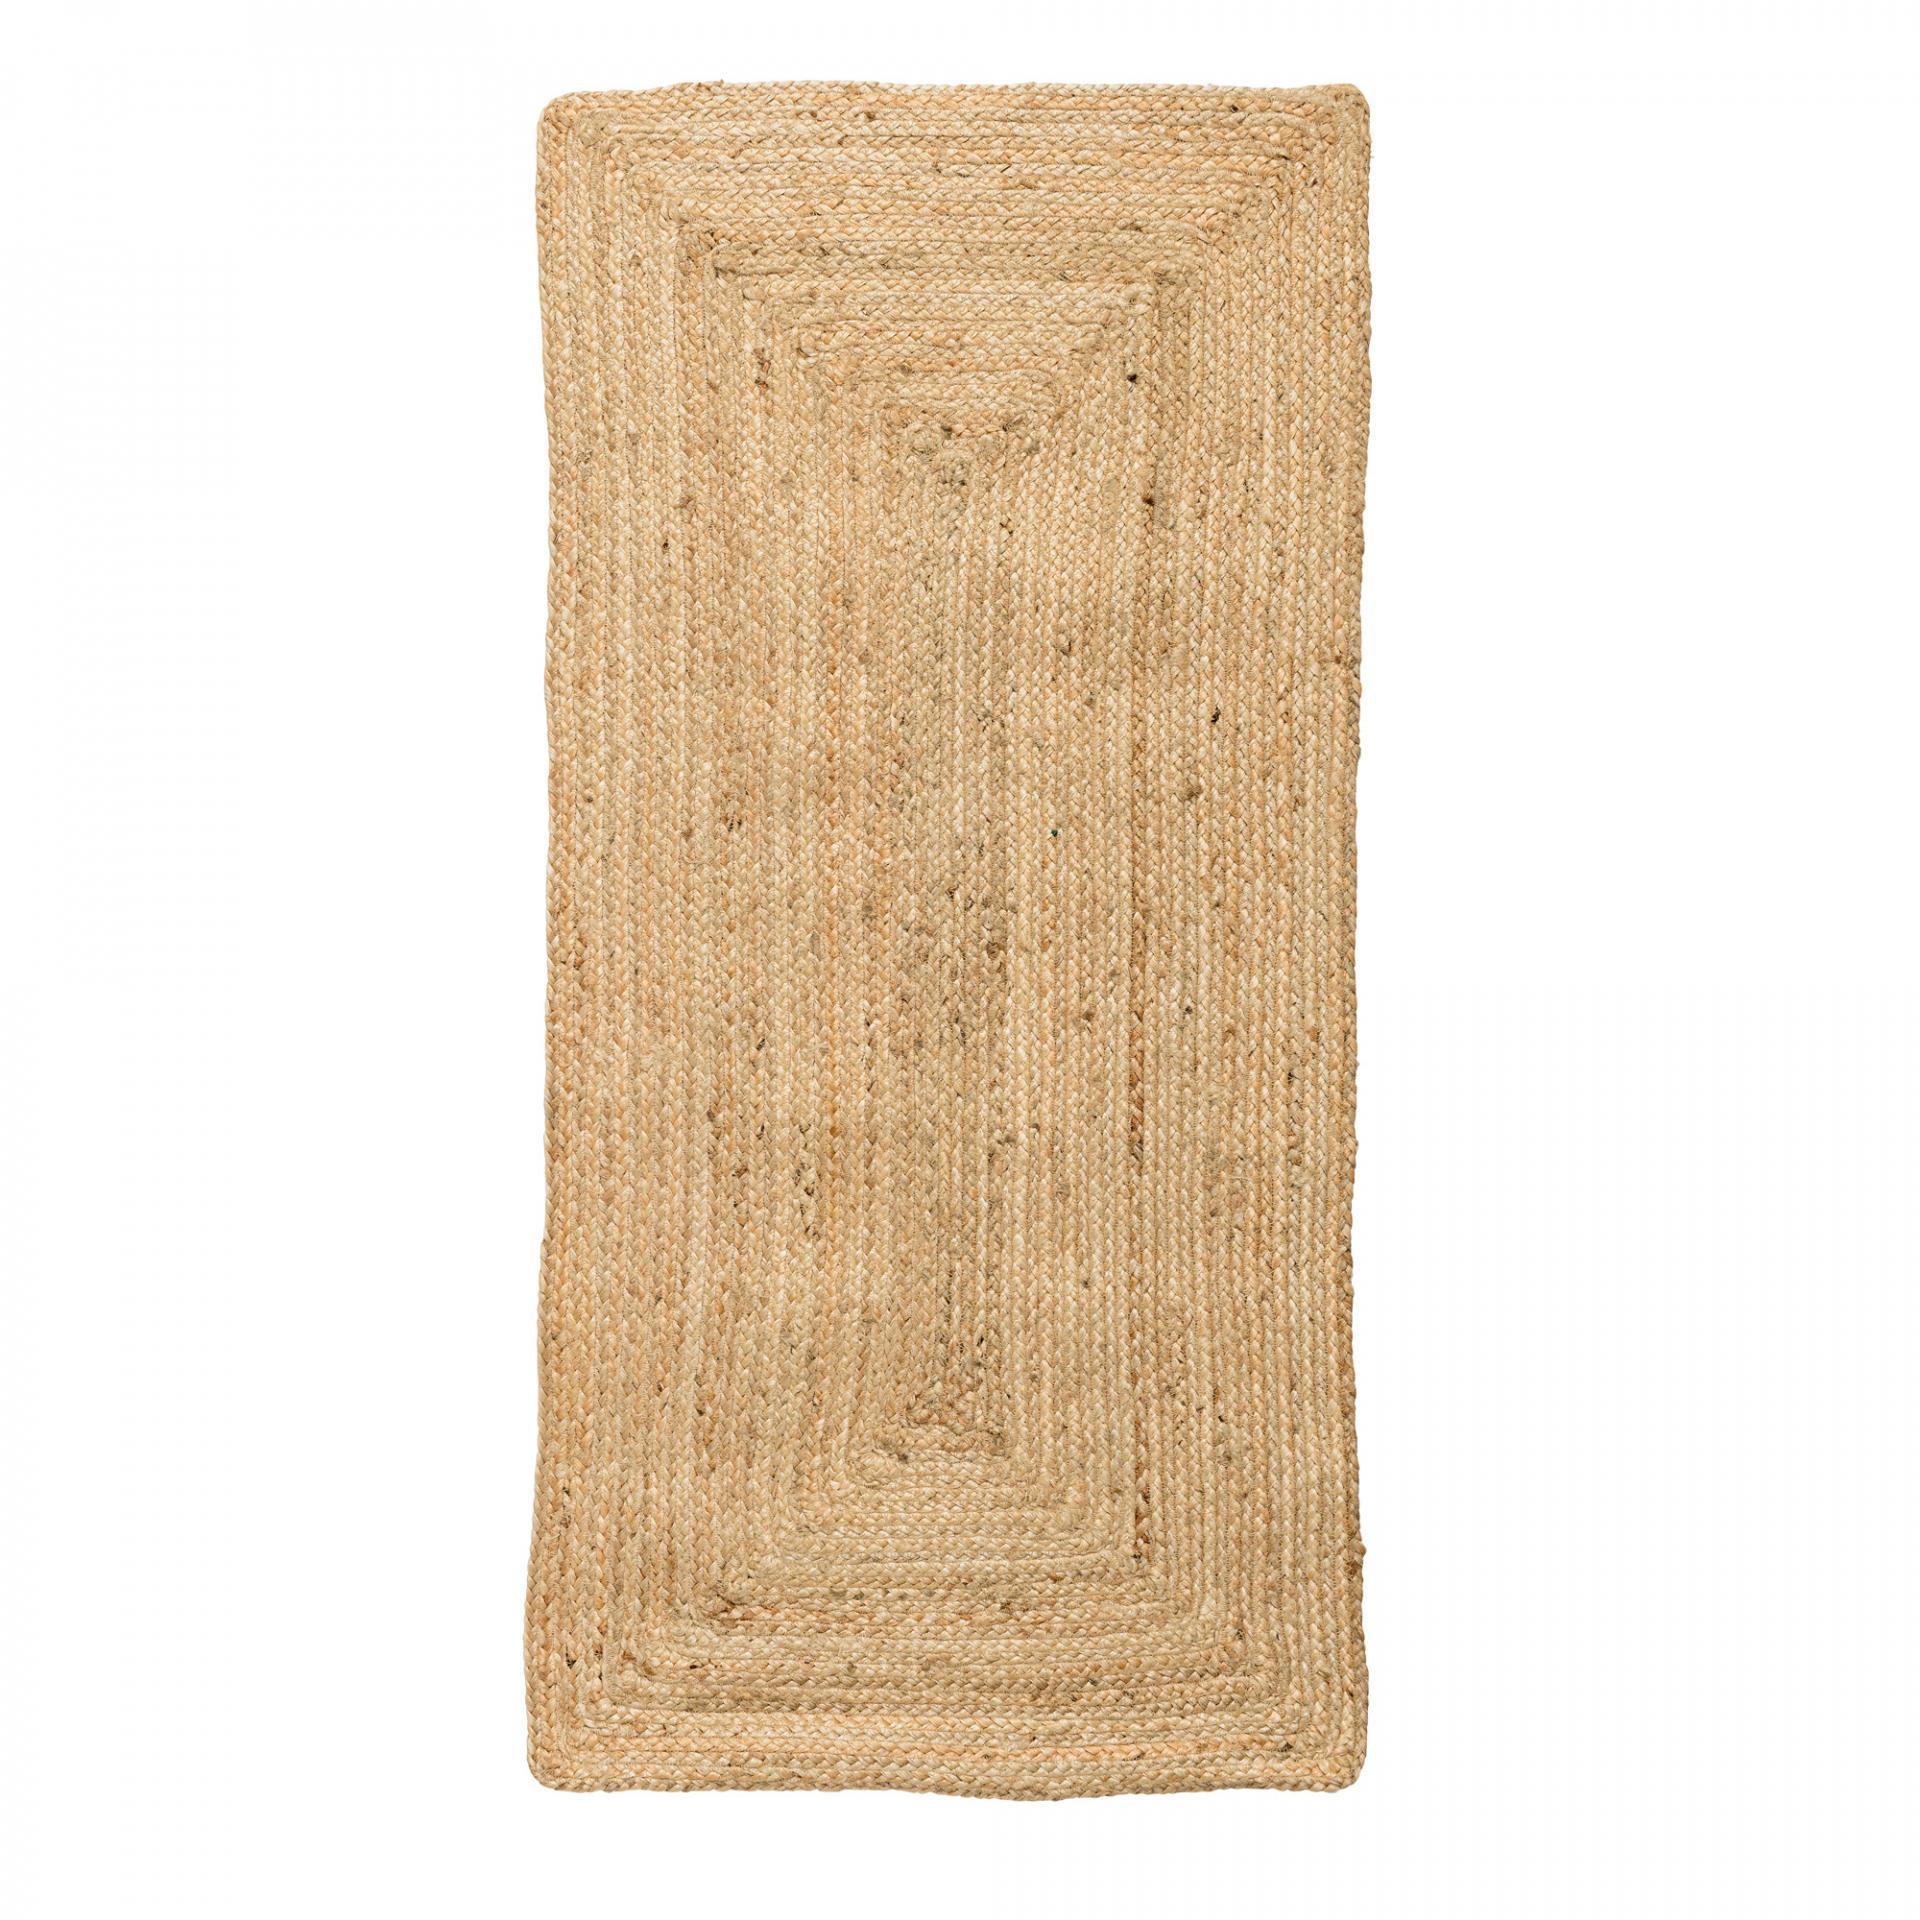 Bloomingville Jutový koberec Nature 60x120 Hnědá